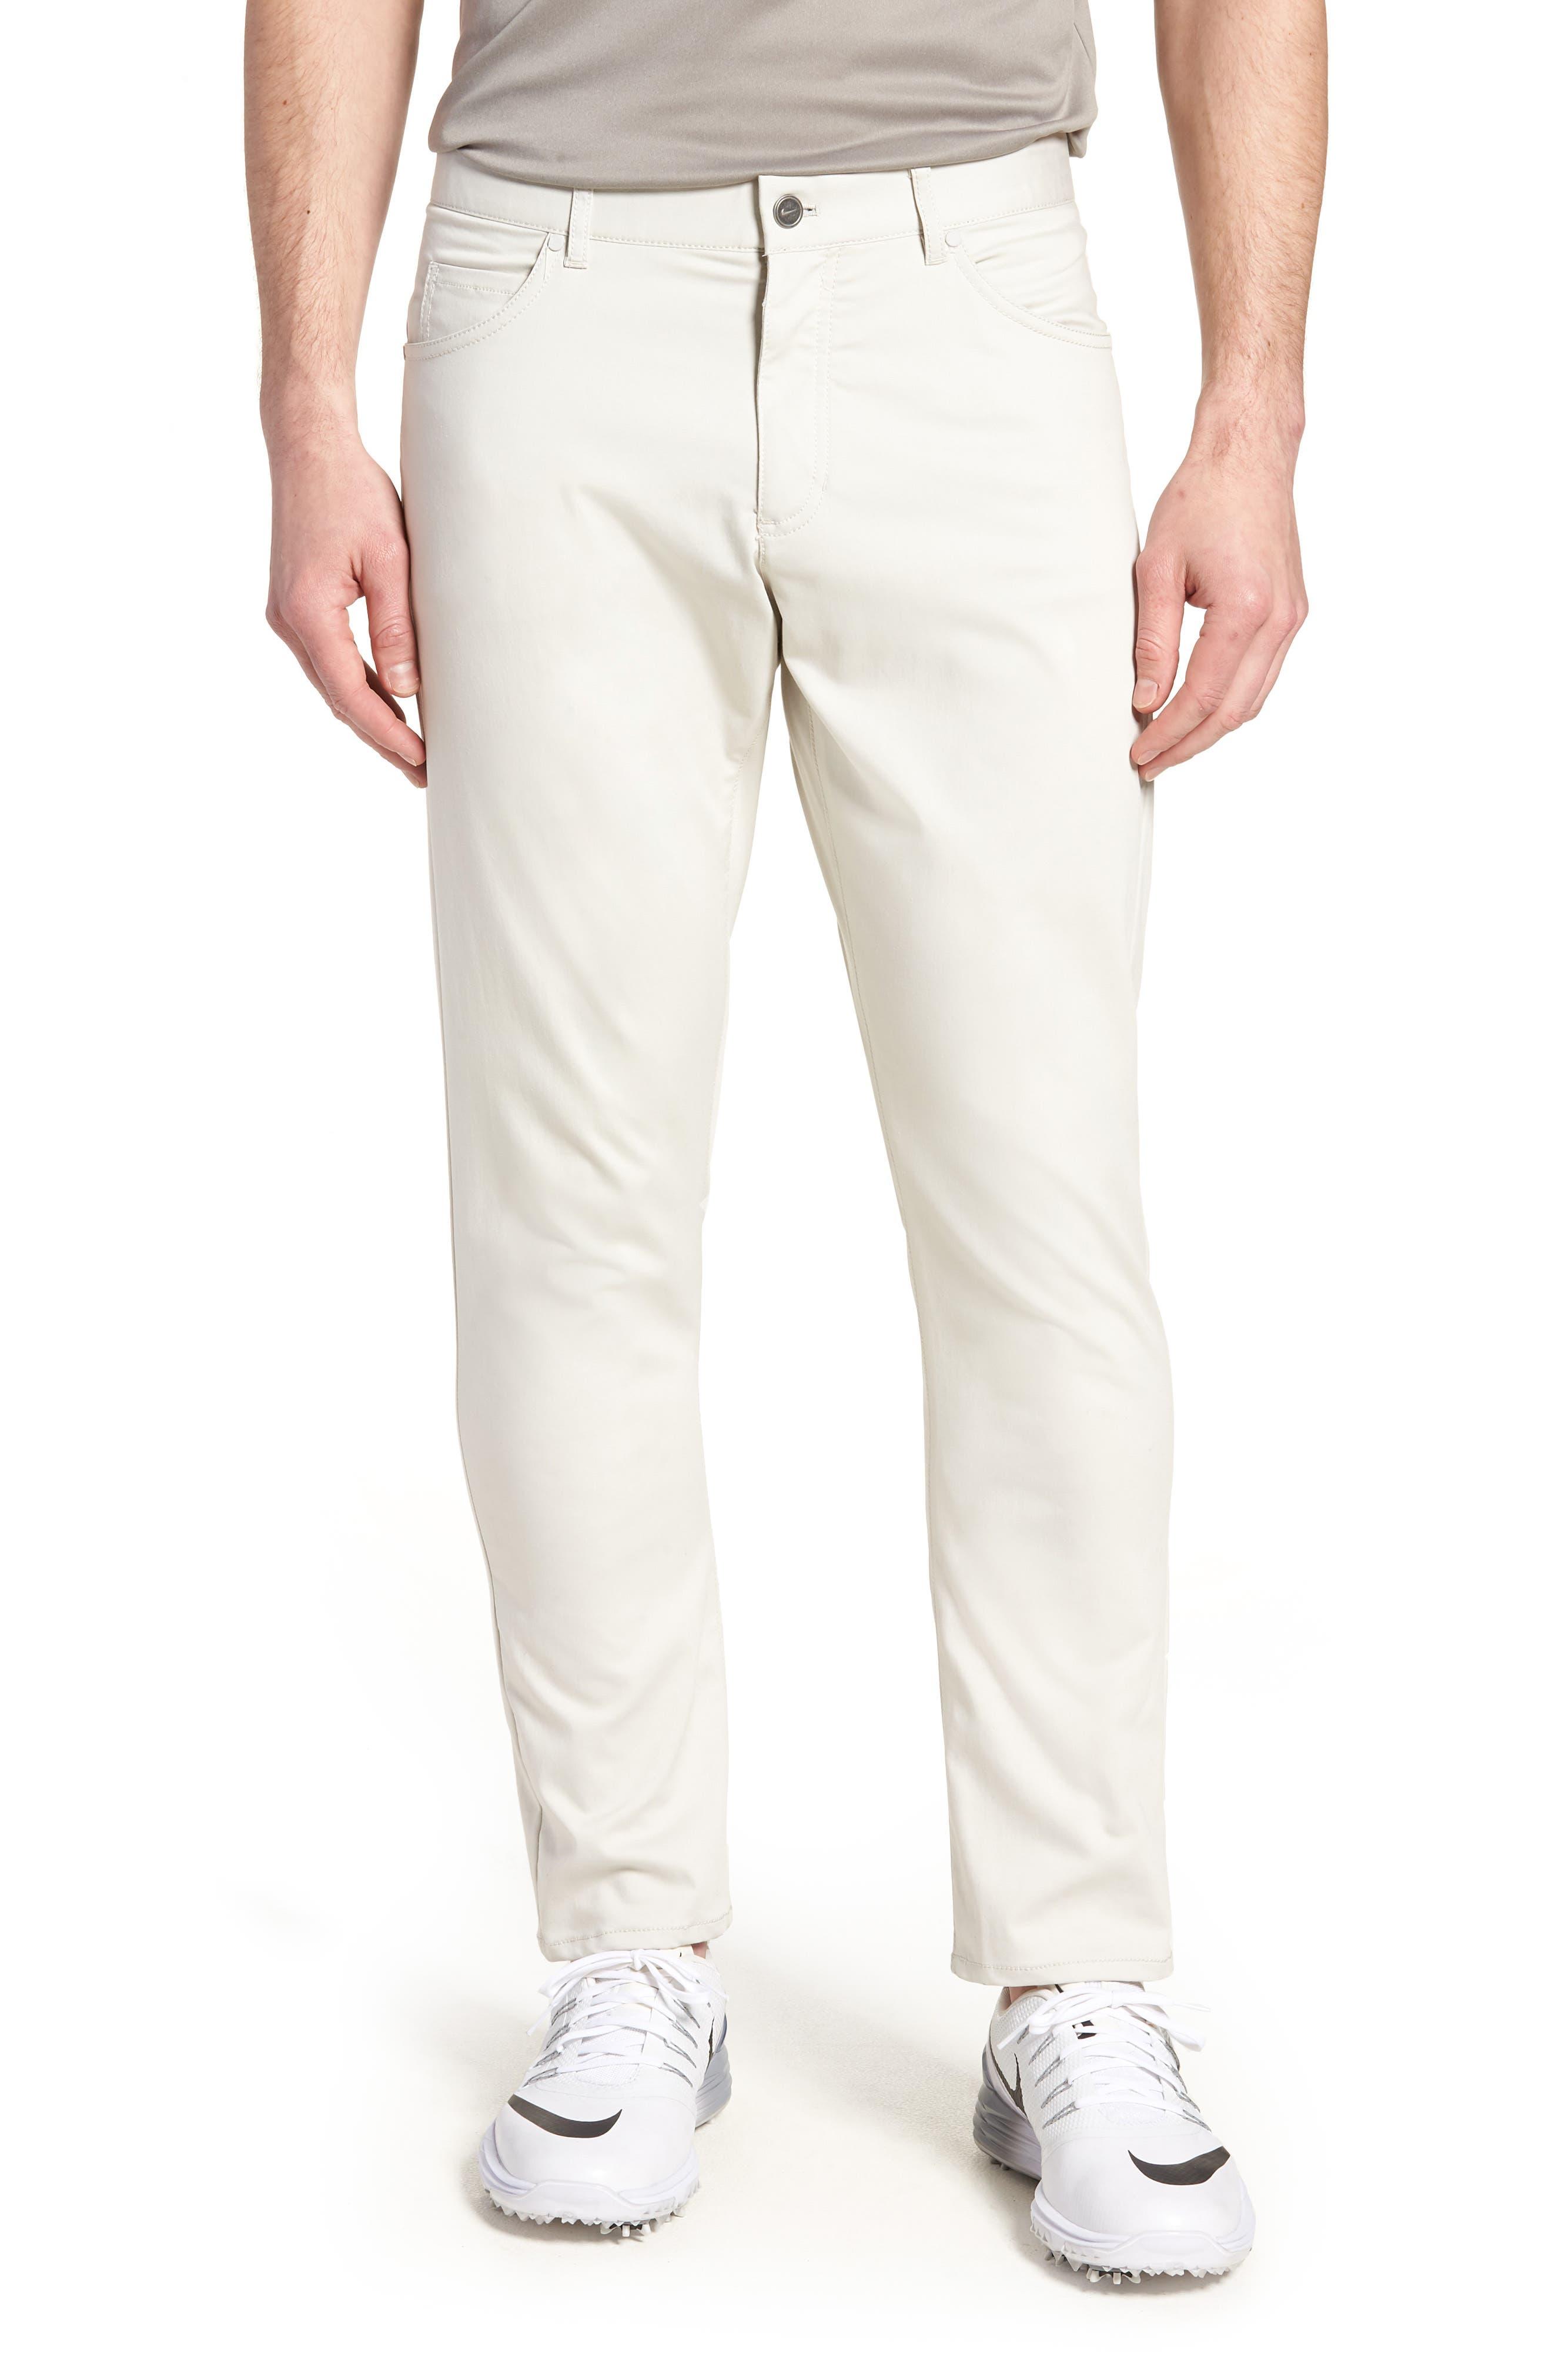 Dry Flex Slim Fit Golf Pants,                             Main thumbnail 1, color,                             LIGHT BONE/ WHITE